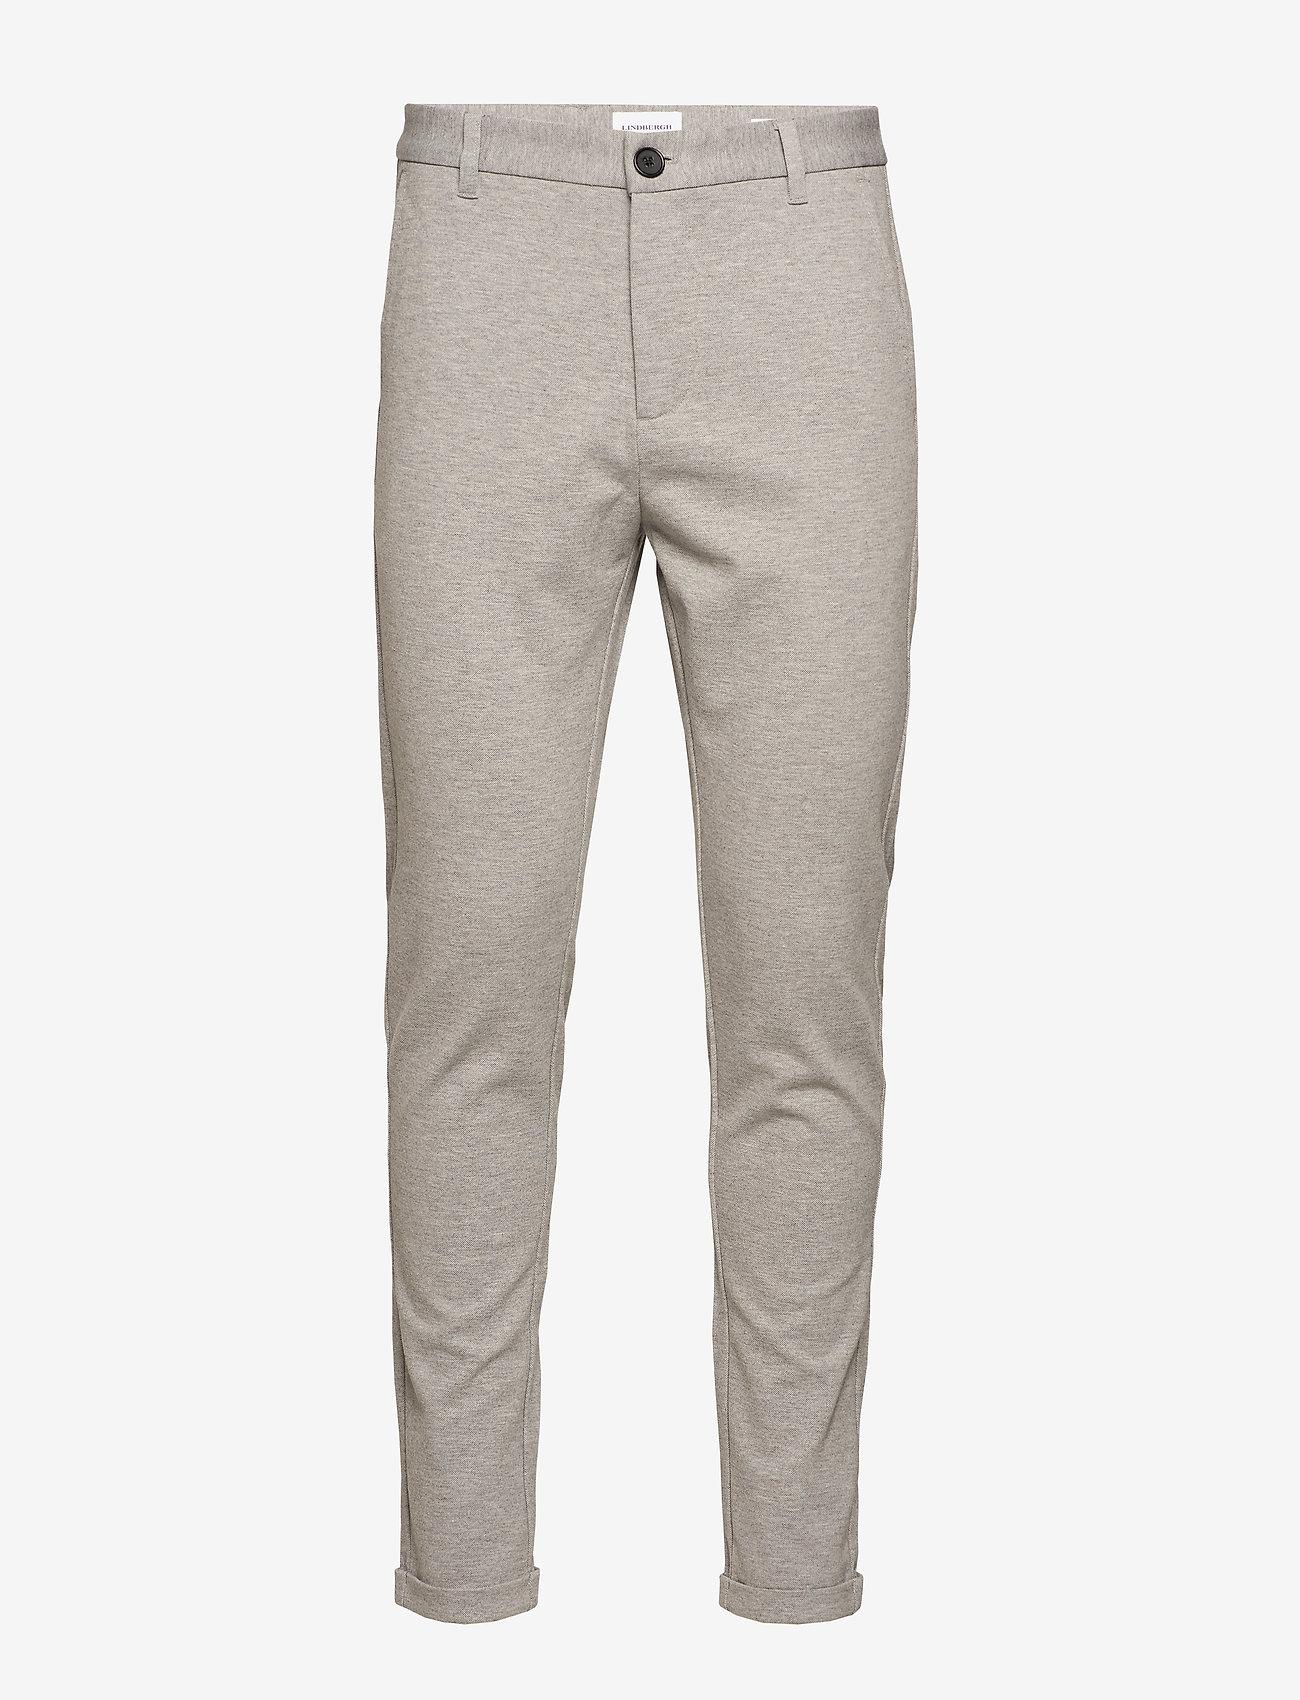 Lindbergh - Knitted pants normal length - spodnie na co dzień - lt grey mix - 0